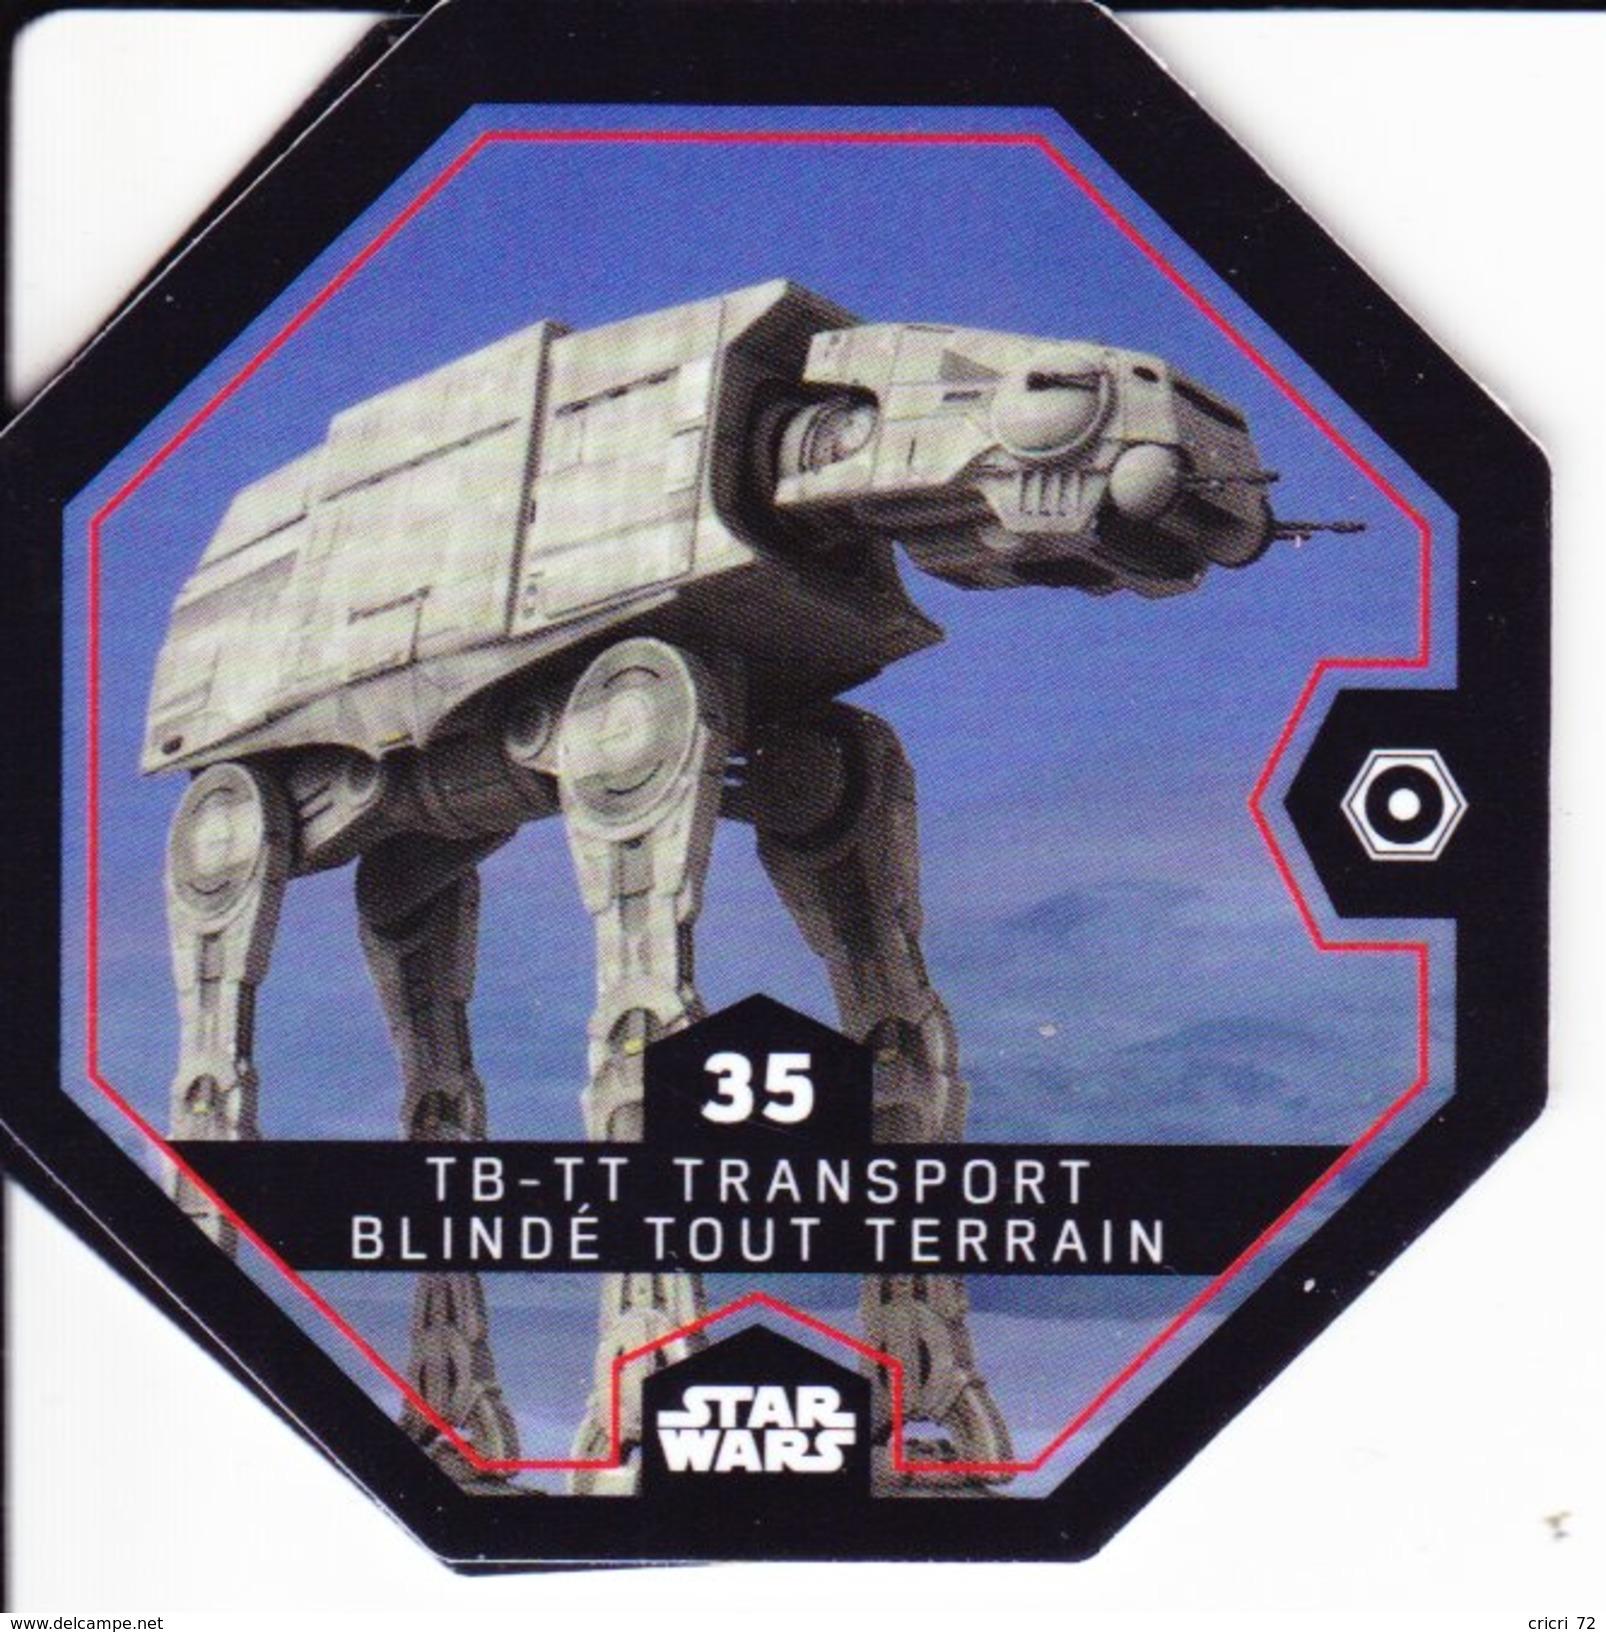 35 TB-TT TRANSPORT BLINDE TOUT TERRAIN 2016 STAR WARS LECLERC COSMIC SHELLS - Episode II